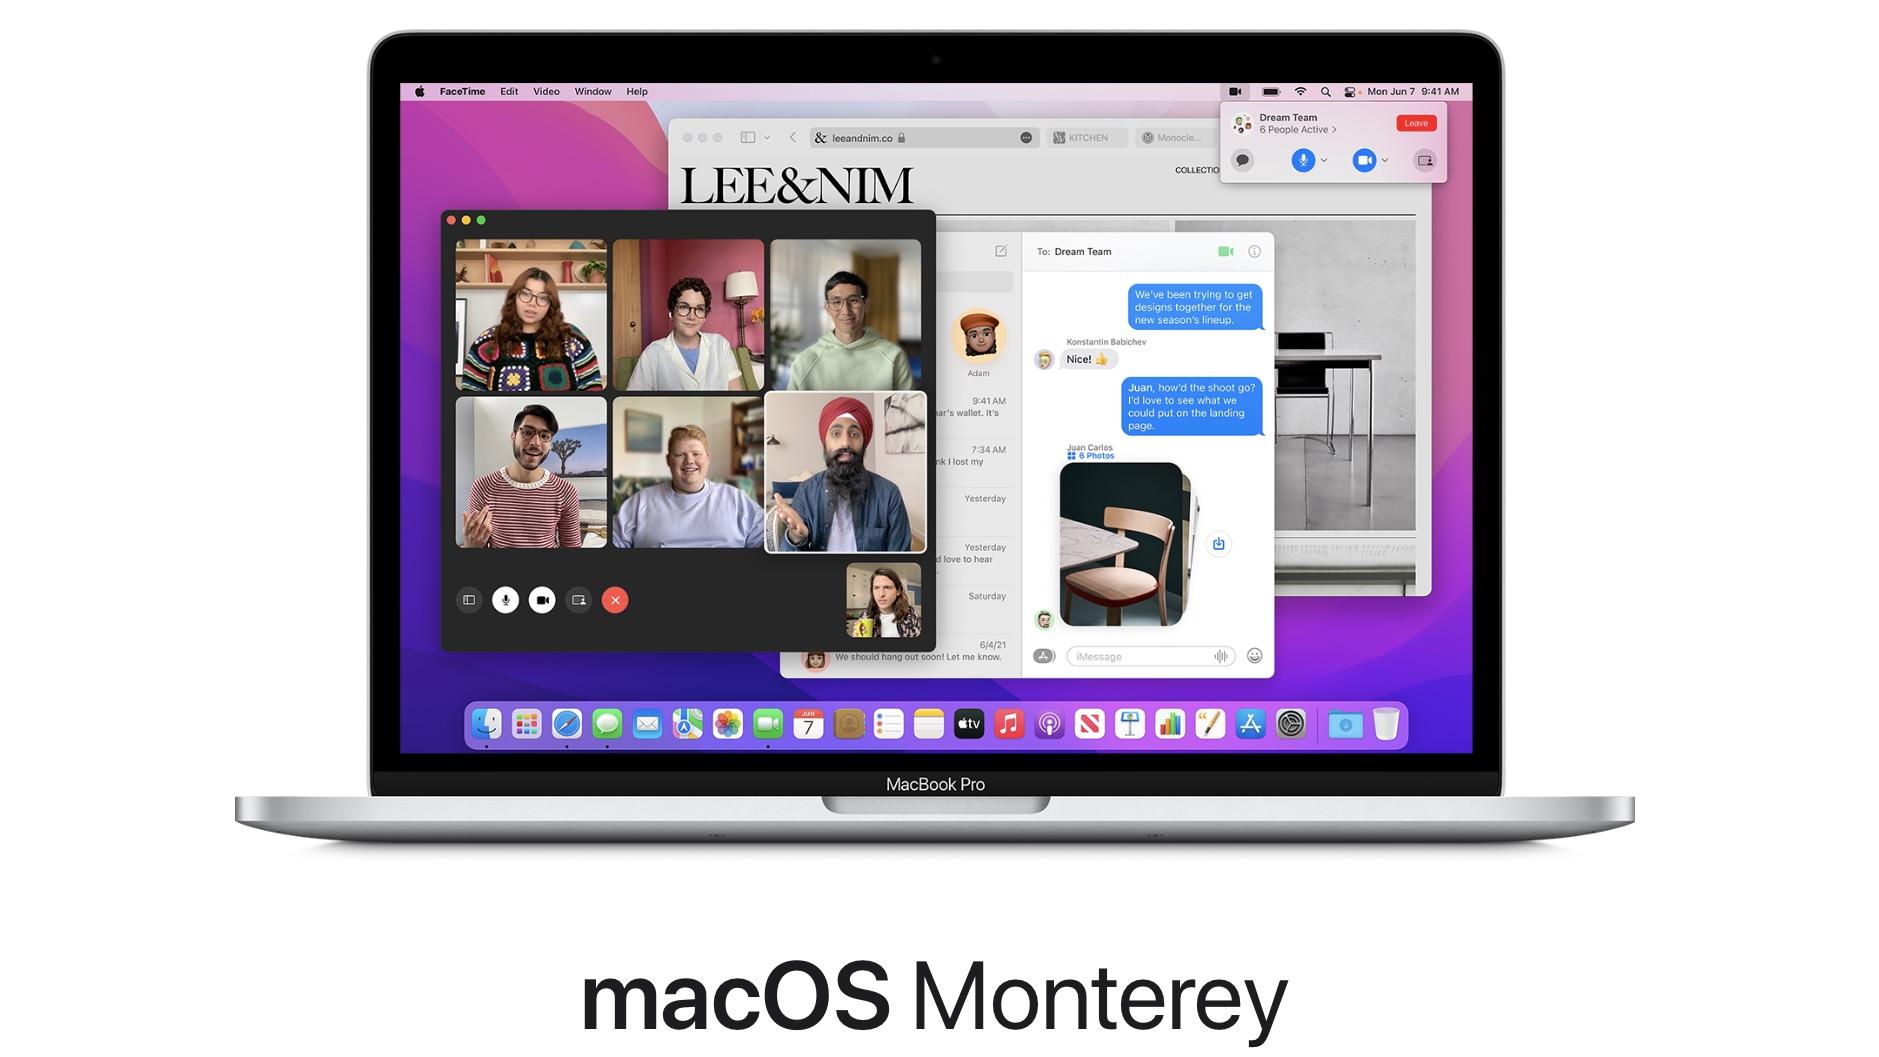 macos-monterey-beta-1.jpg